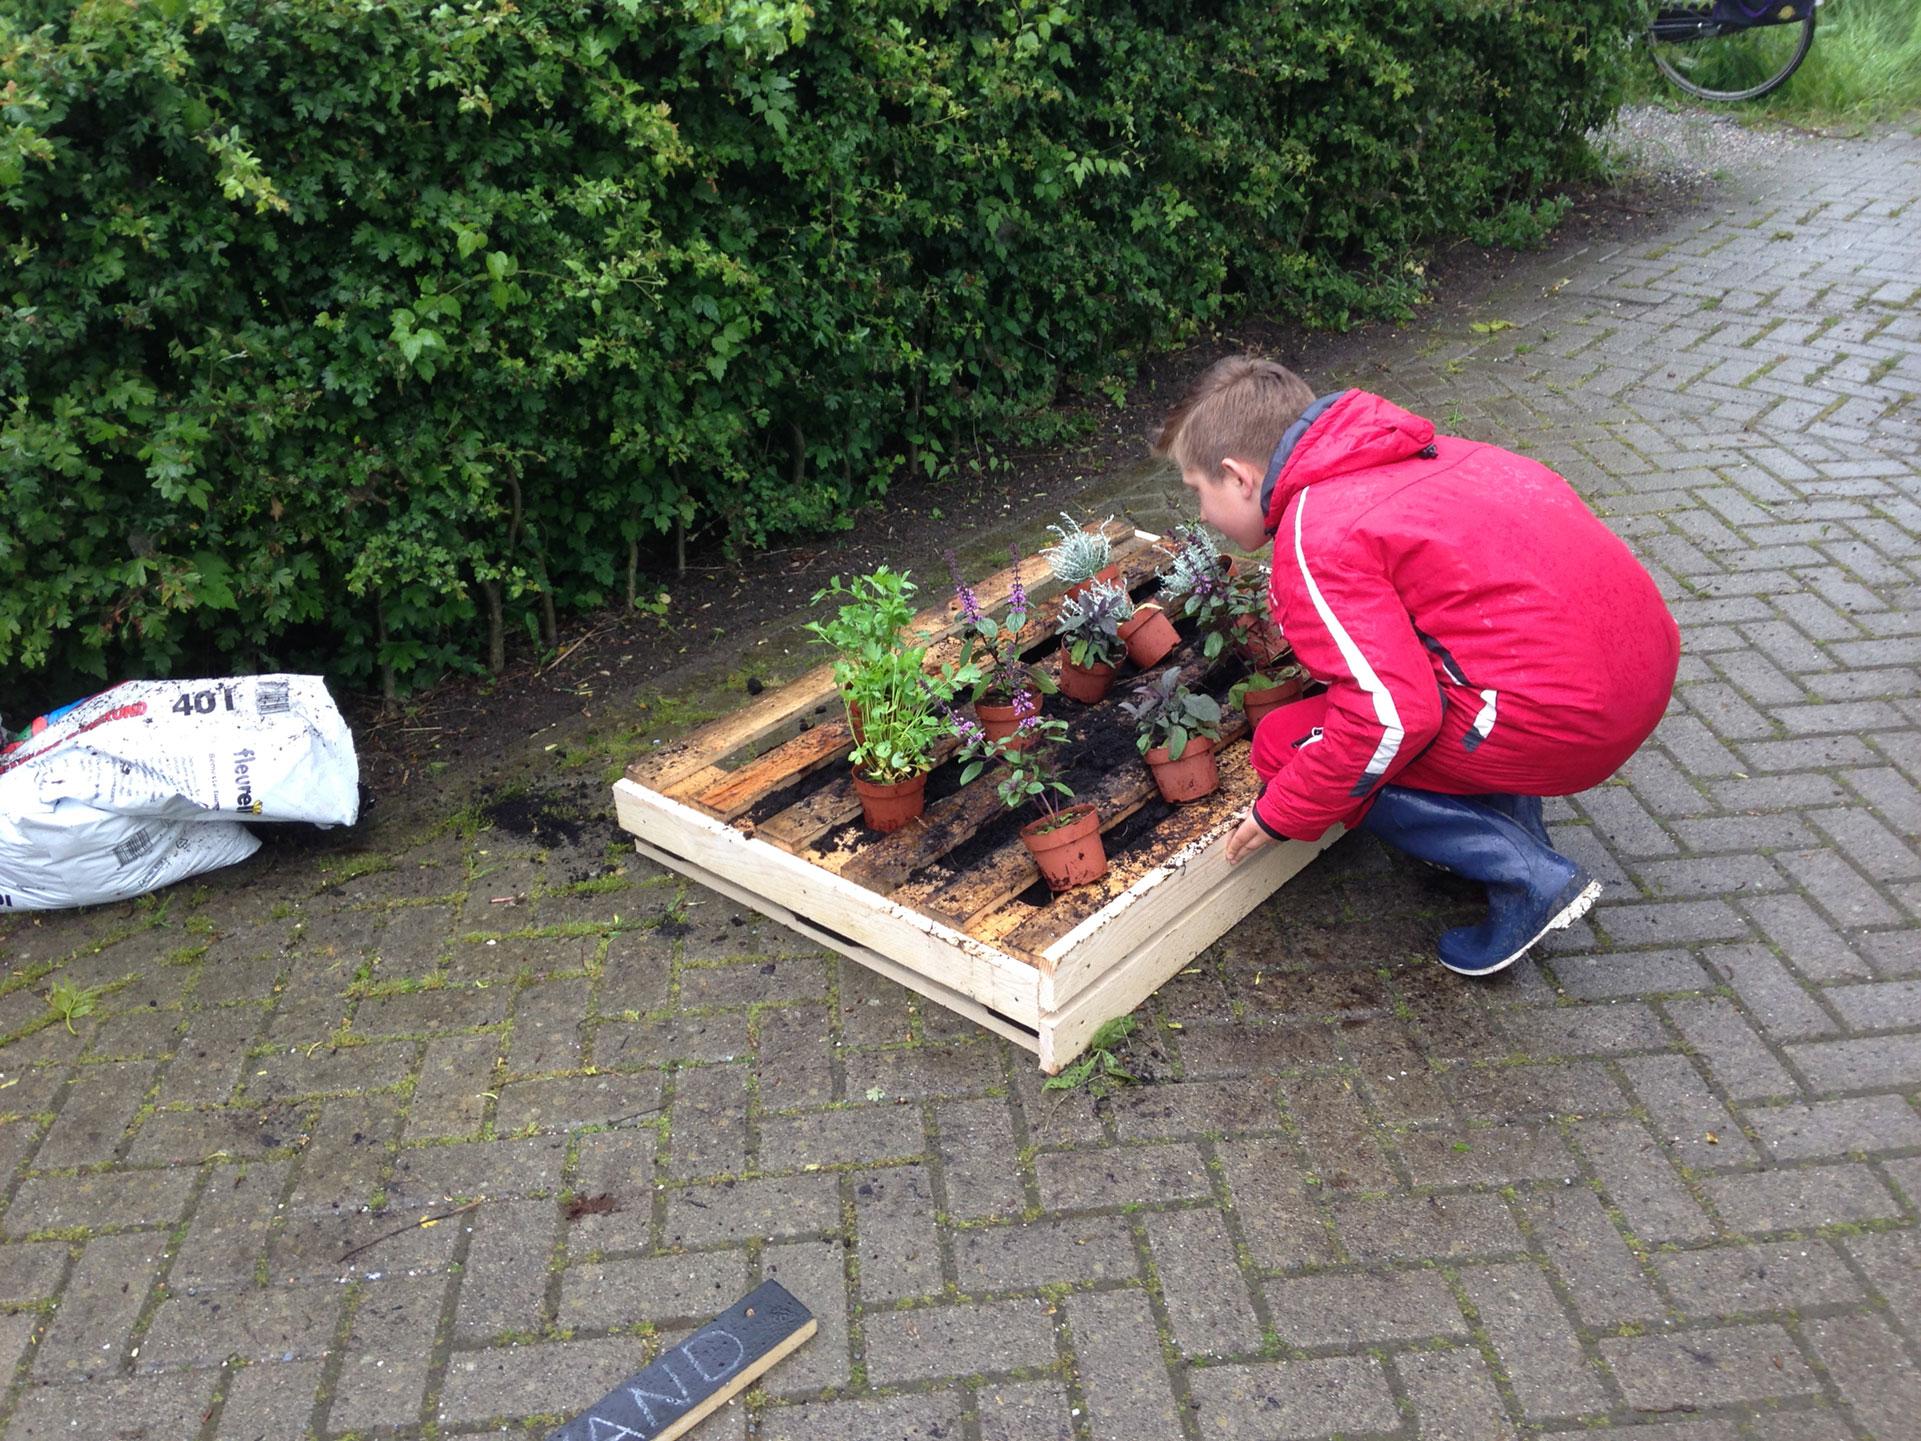 Eetbare tuin groenvorm tuinontwerp for Tuinontwerp eetbare tuin